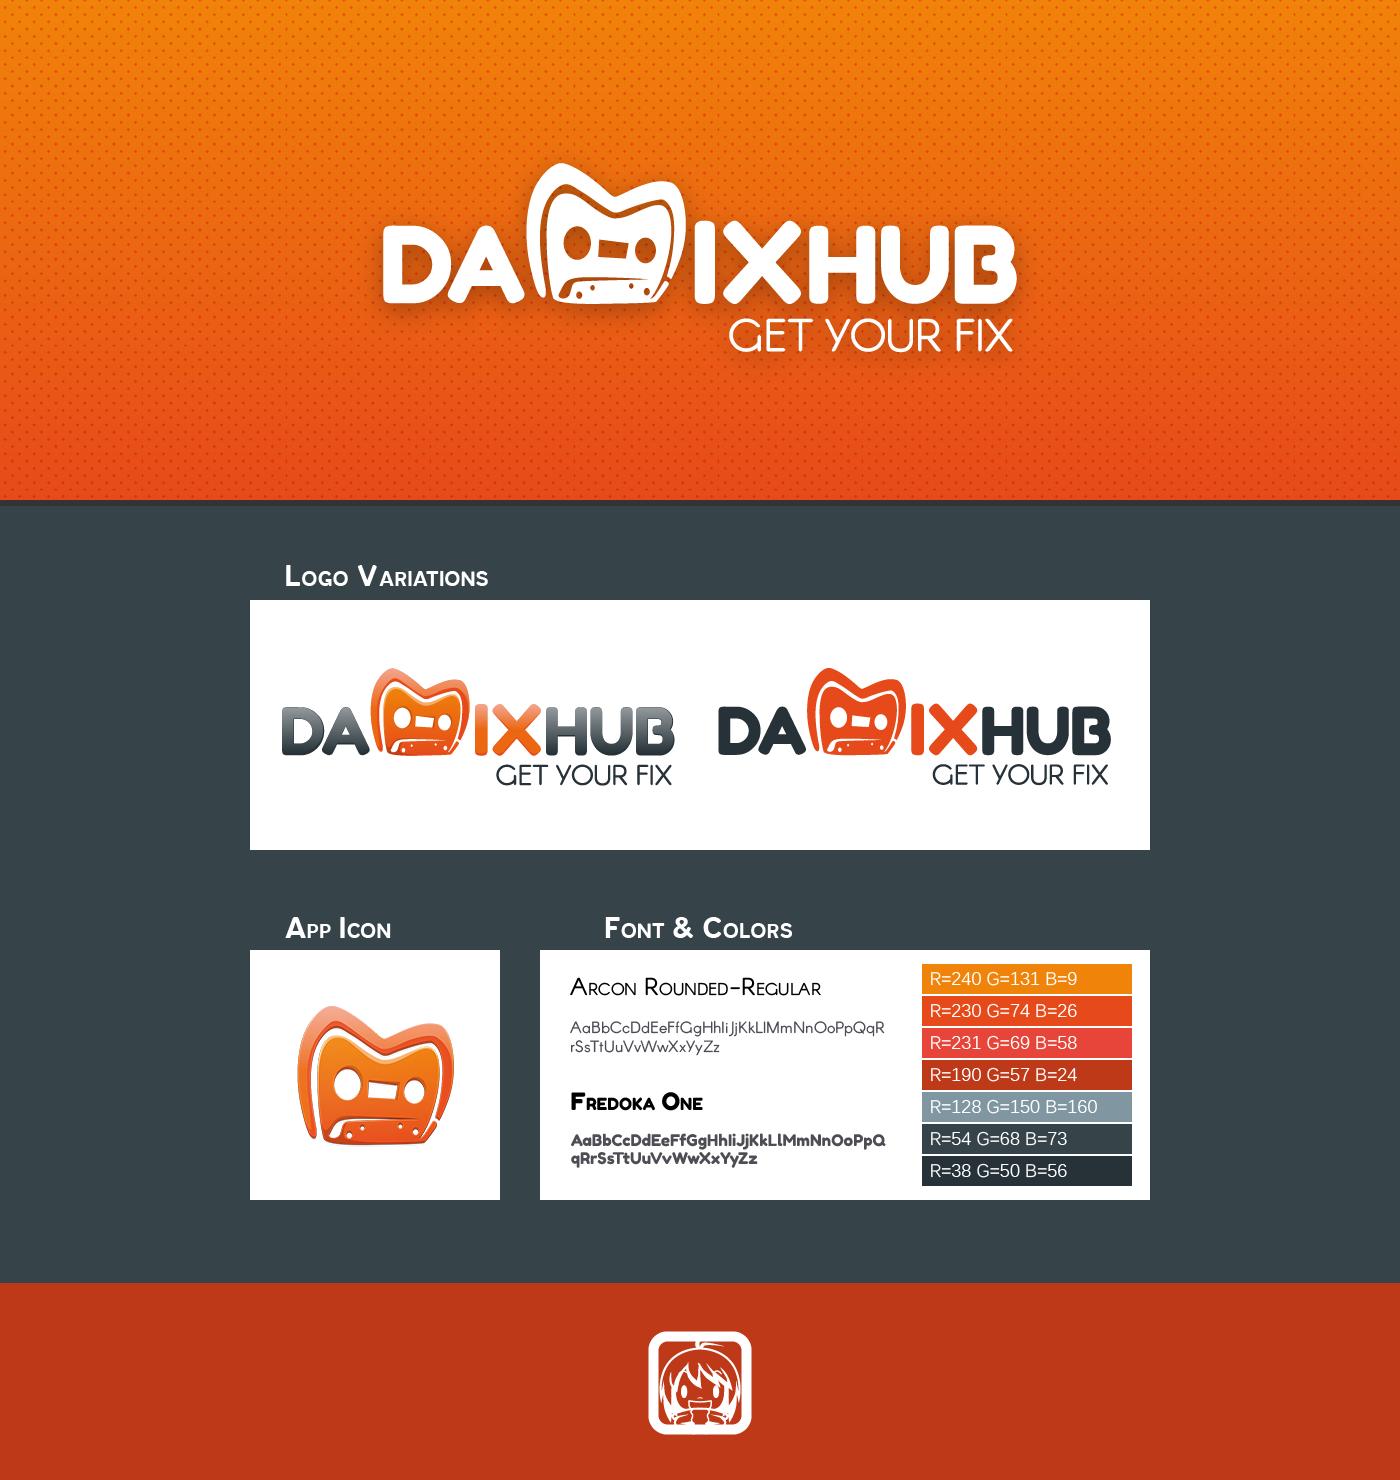 Google Play app application damixhub mix mixtape android Icon logo